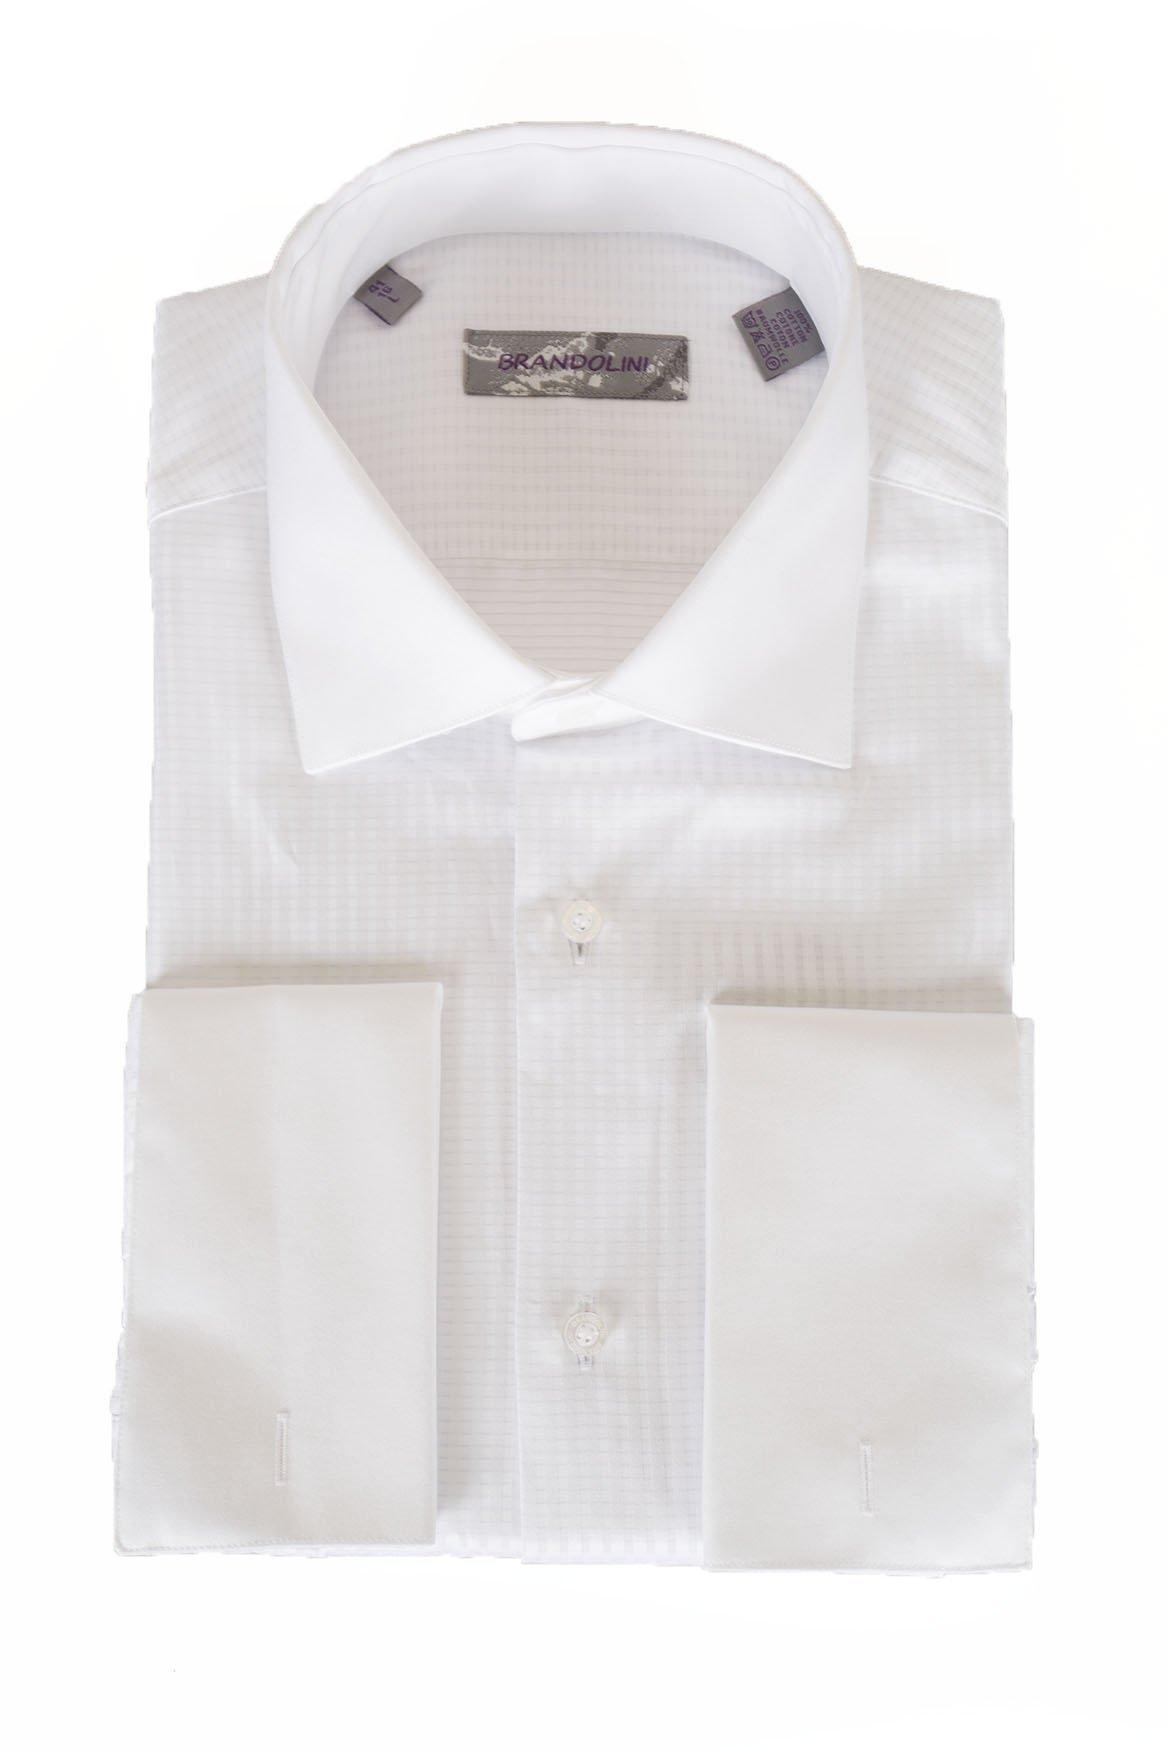 Brandolini Classic Dress Shirt